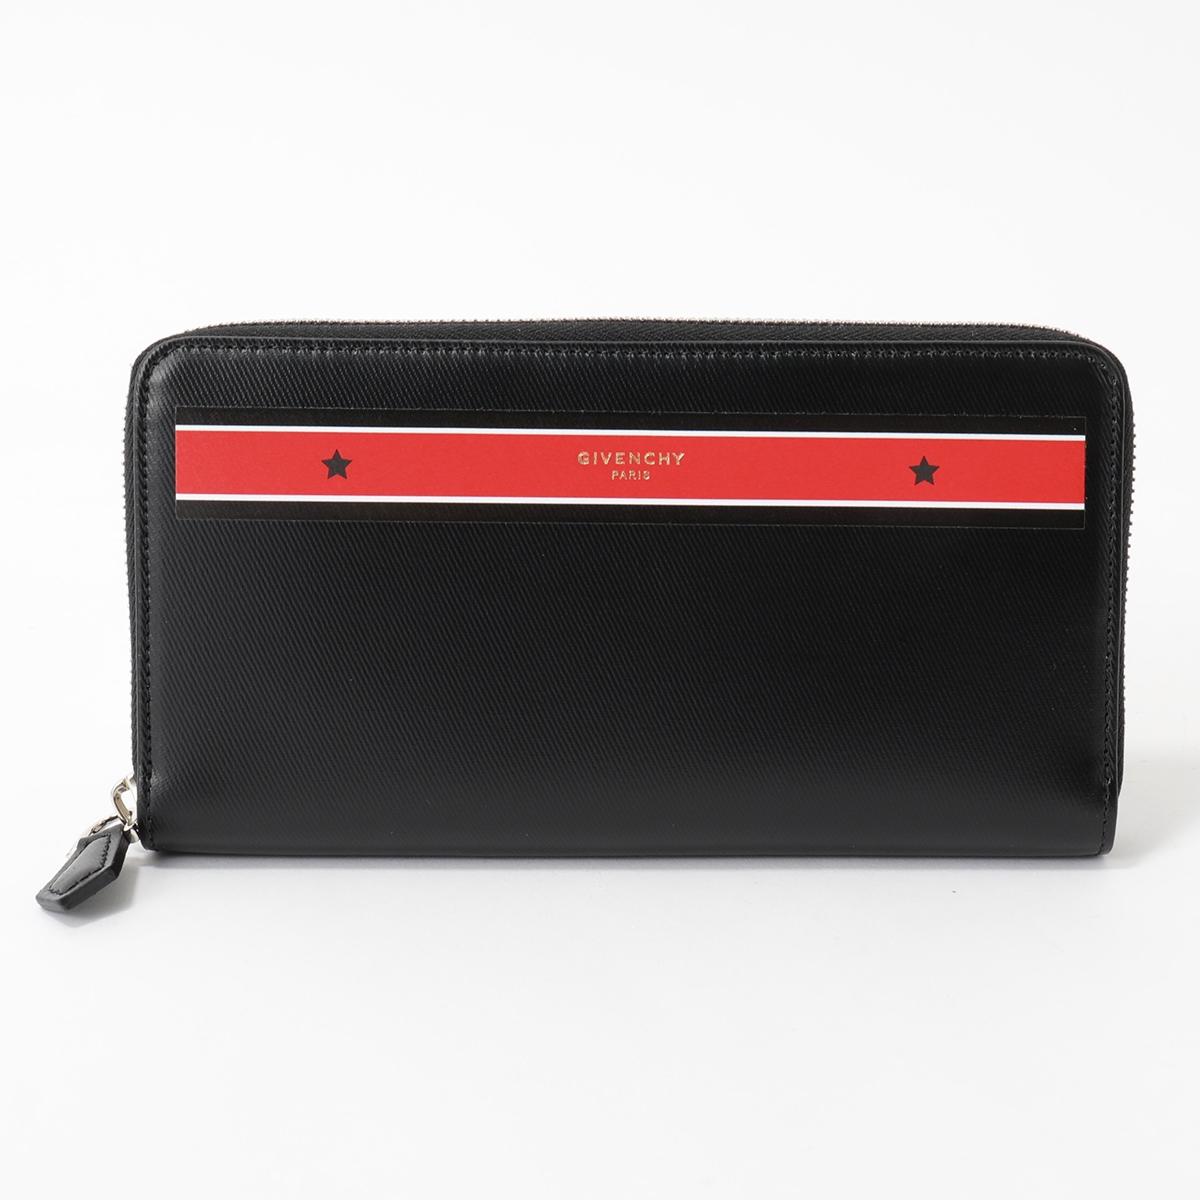 GIVENCHY ジバンシィ BK600GK03P ZIPPED WALLET ラウンドファスナー 長財布 スターライン カラー009/BLACK-RED メンズ